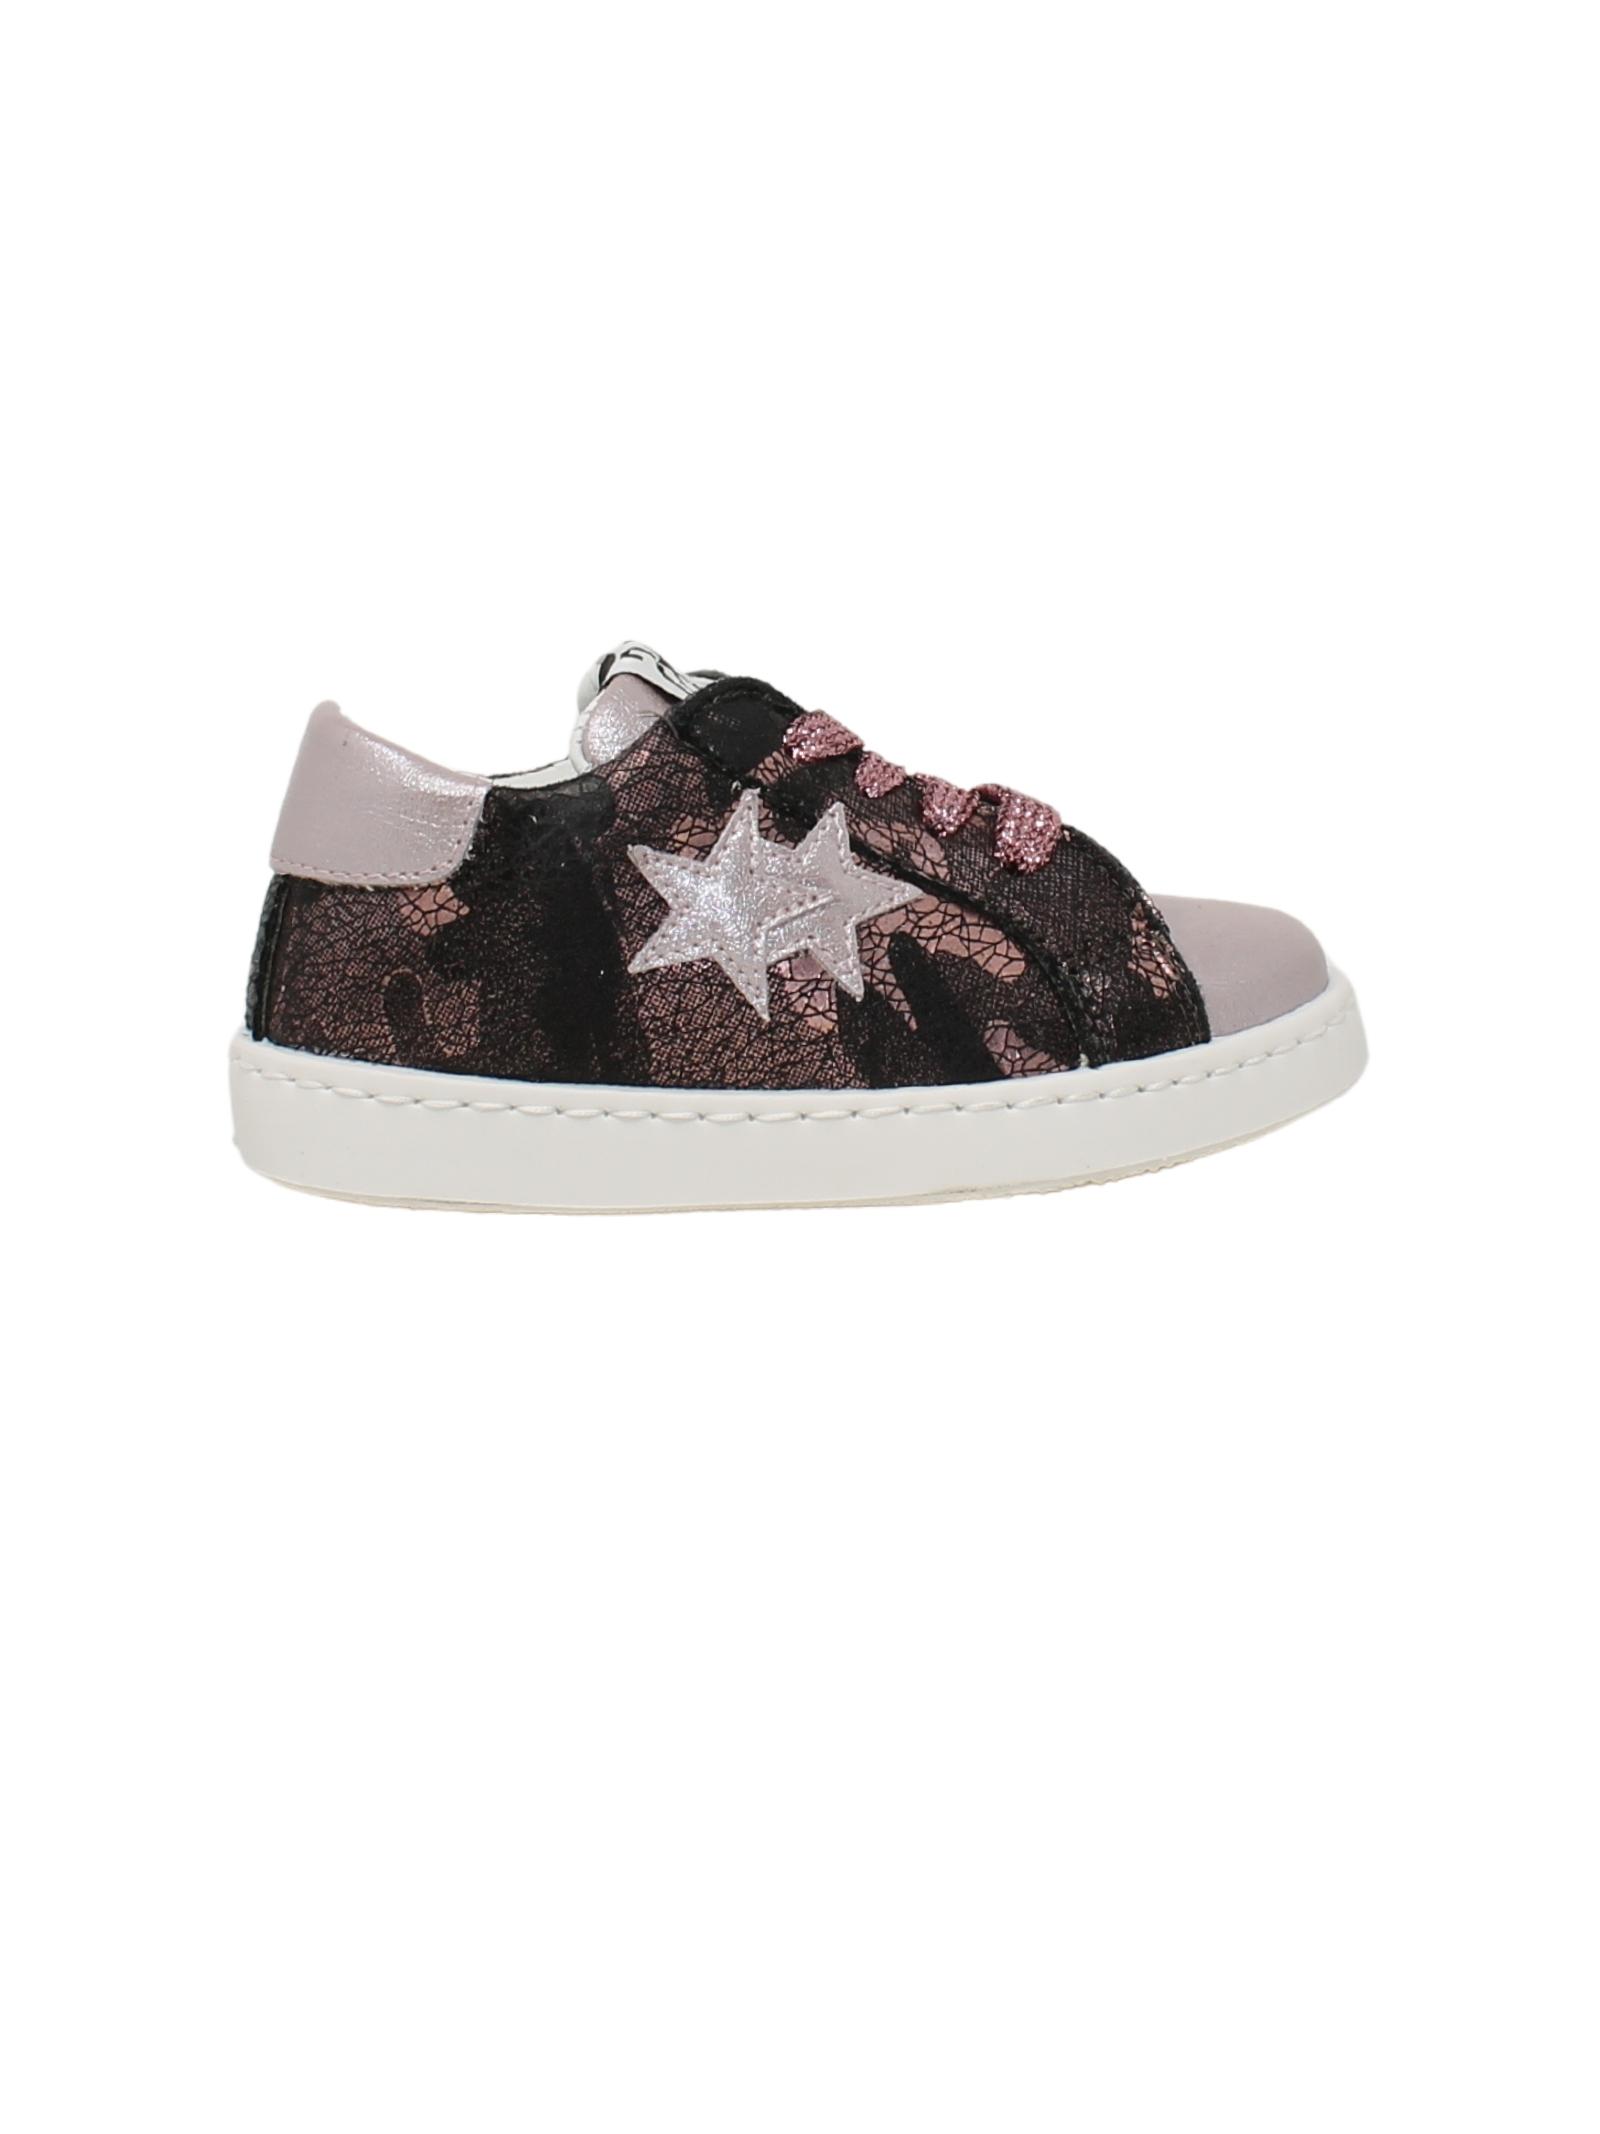 Sneakers Low Glitter Bambina 2STAR KIDS | Sneakers | 2SB2202075